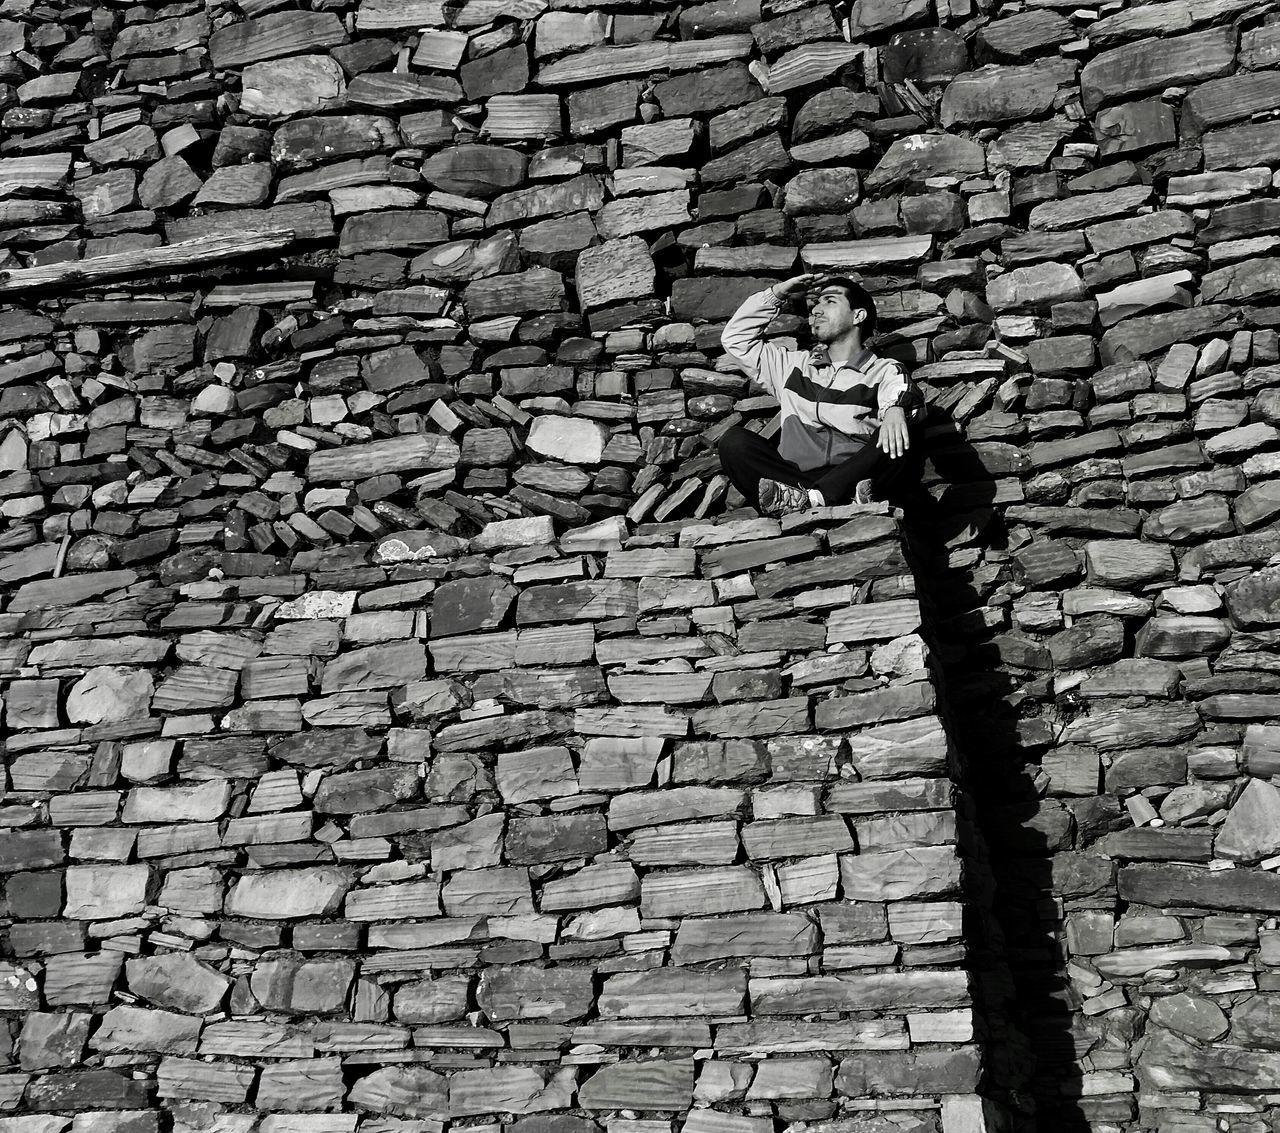 The Wall Capture The Moment BenAfir Stone Wall Enjoying Life Morocco Beautiful Taking Photos Photography Enjoyingtheview Showcase: December